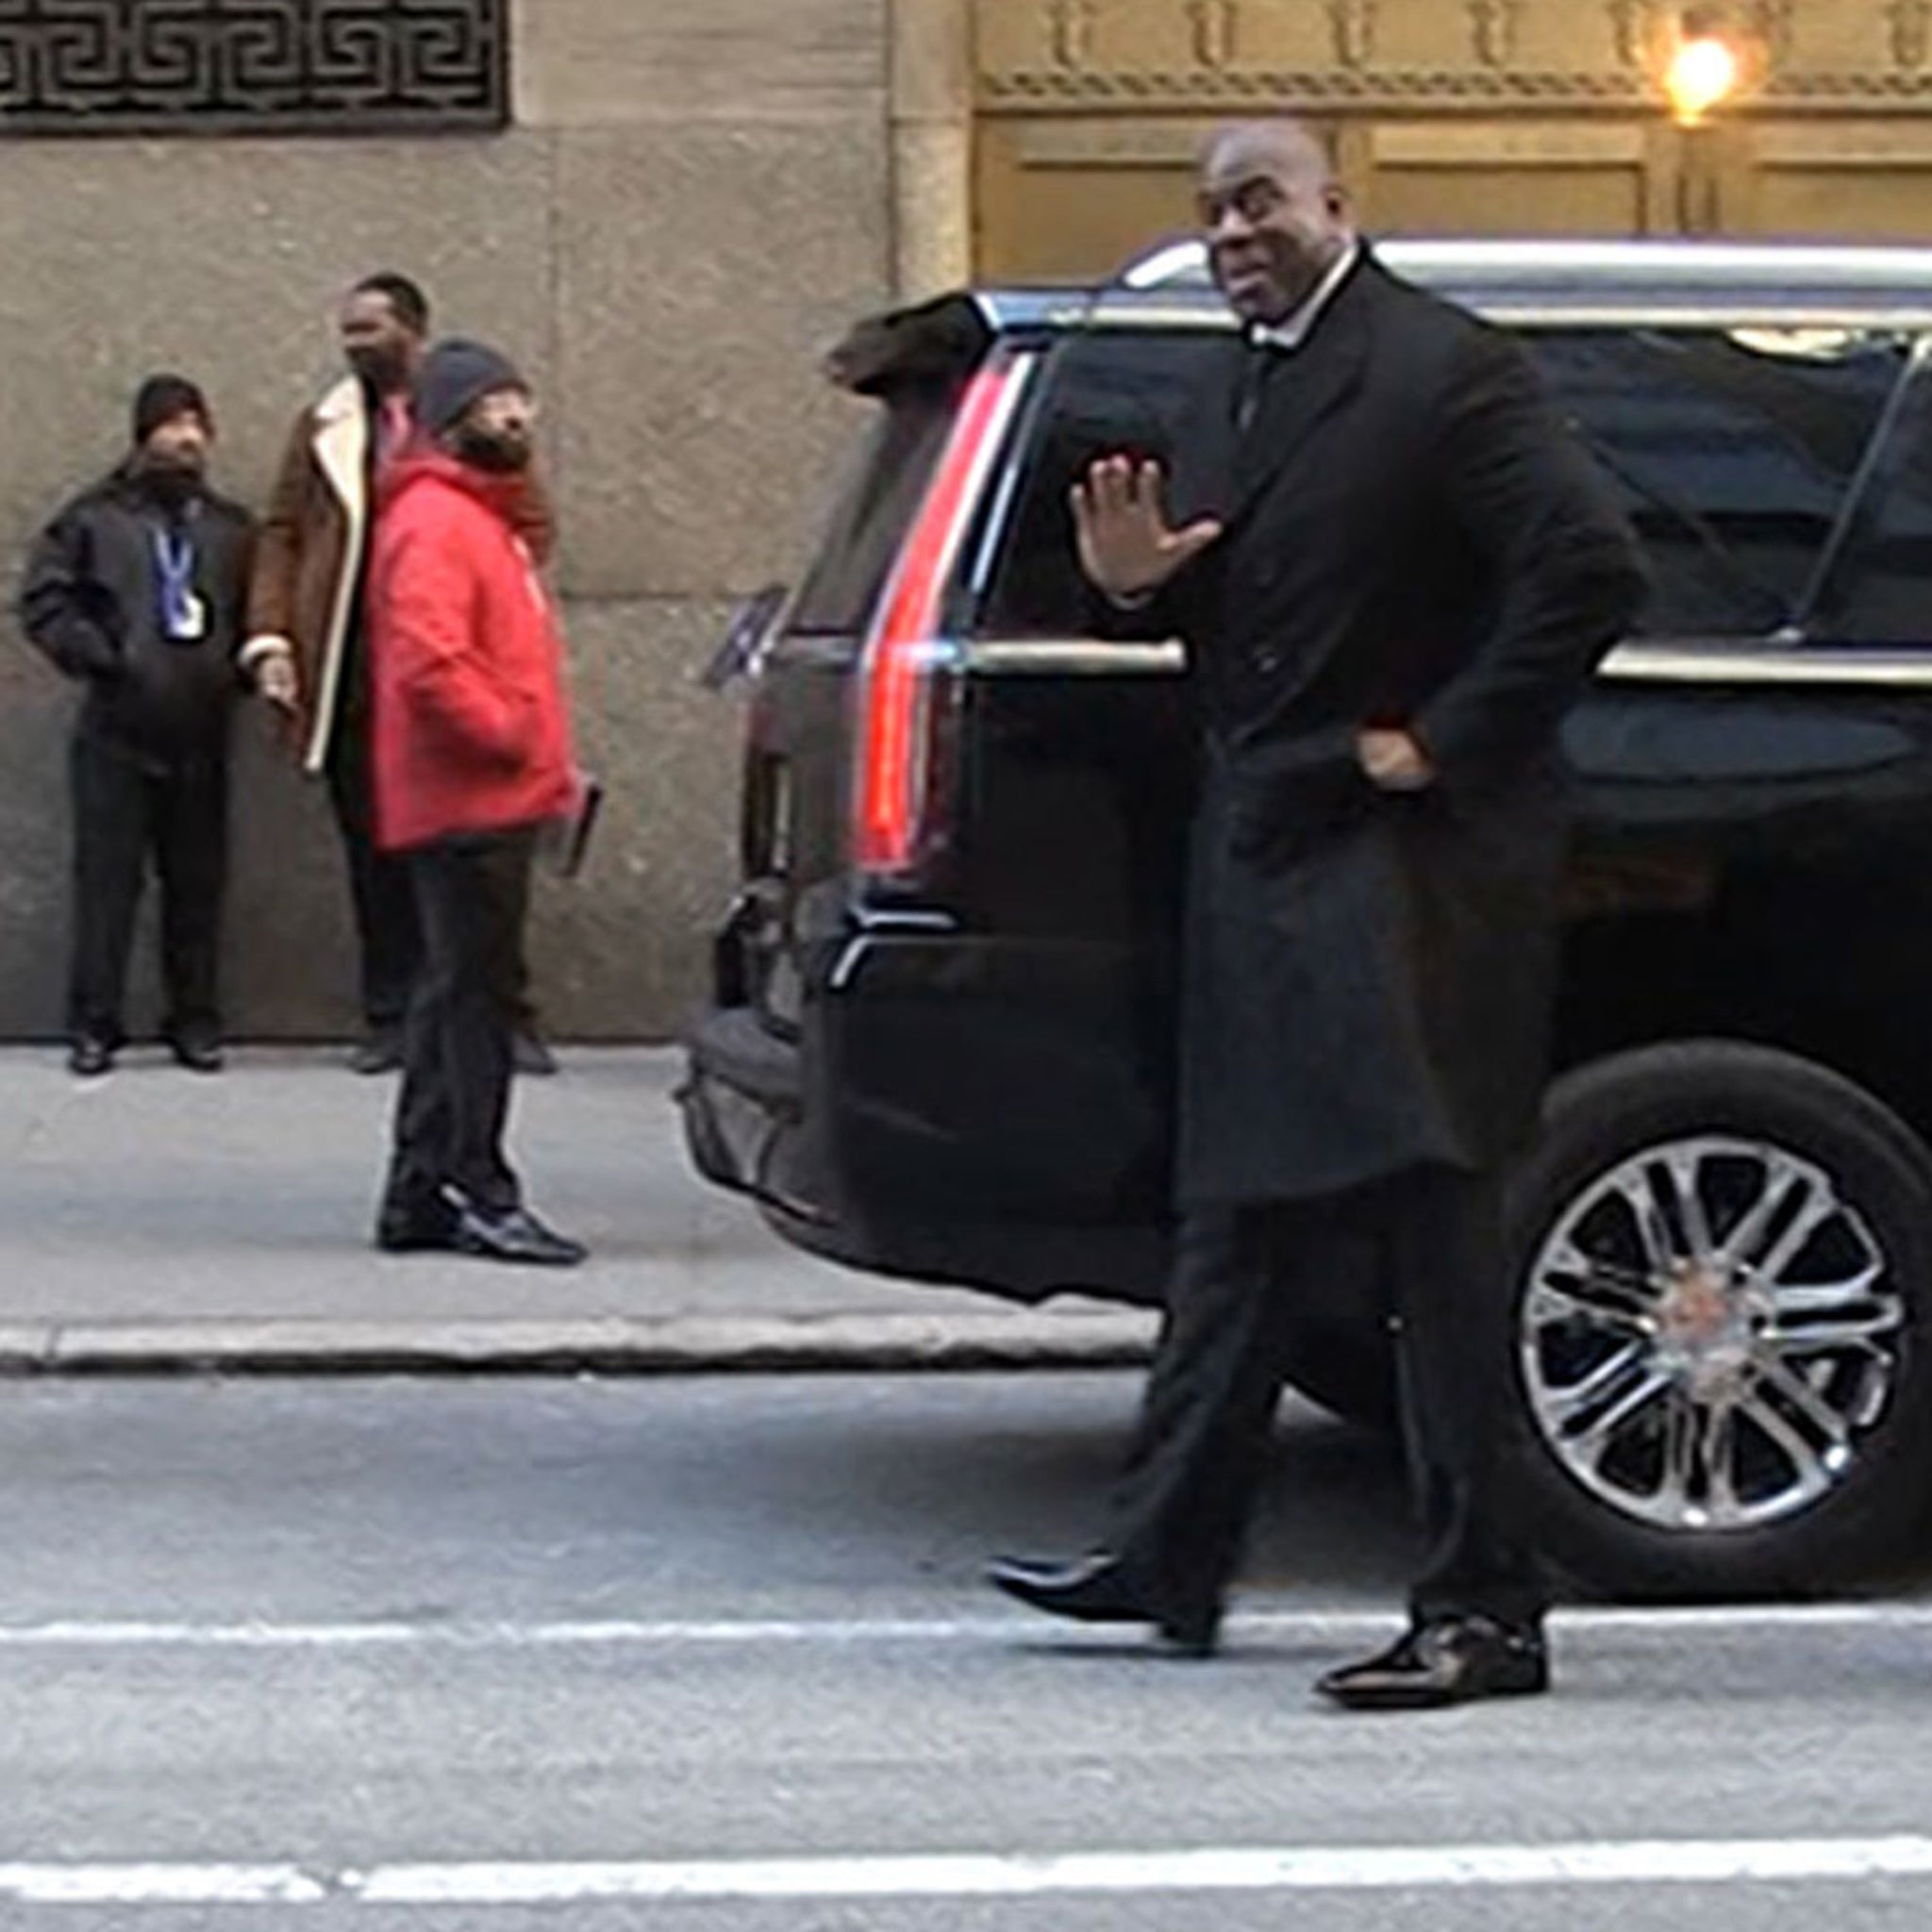 Magic Johnson Gets Emotional at David Stern Memorial, 'I'll Miss My Angel'